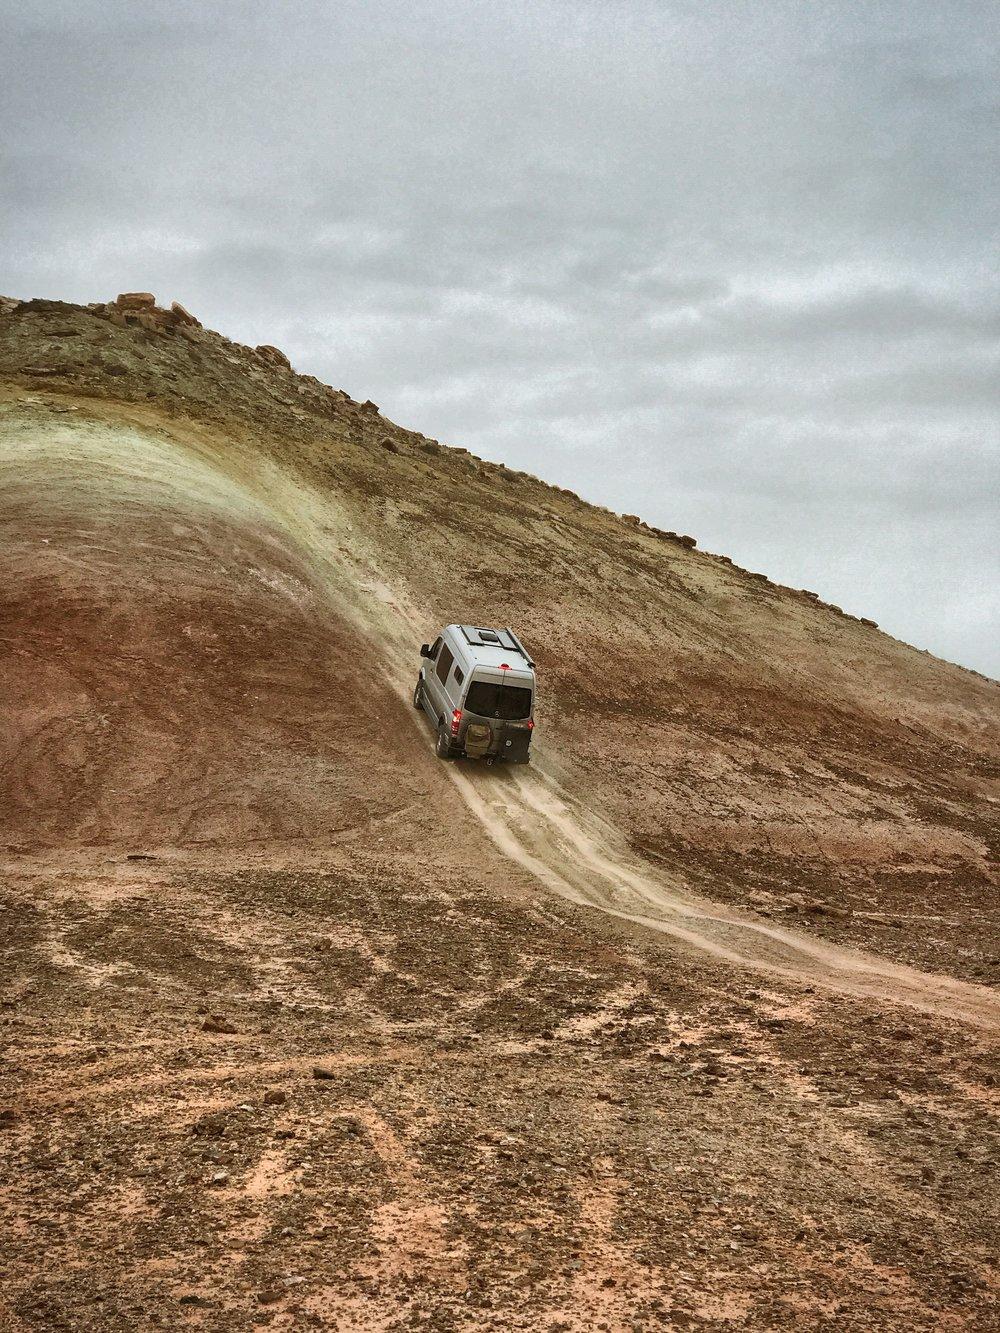 Practicing a failed hill climb.